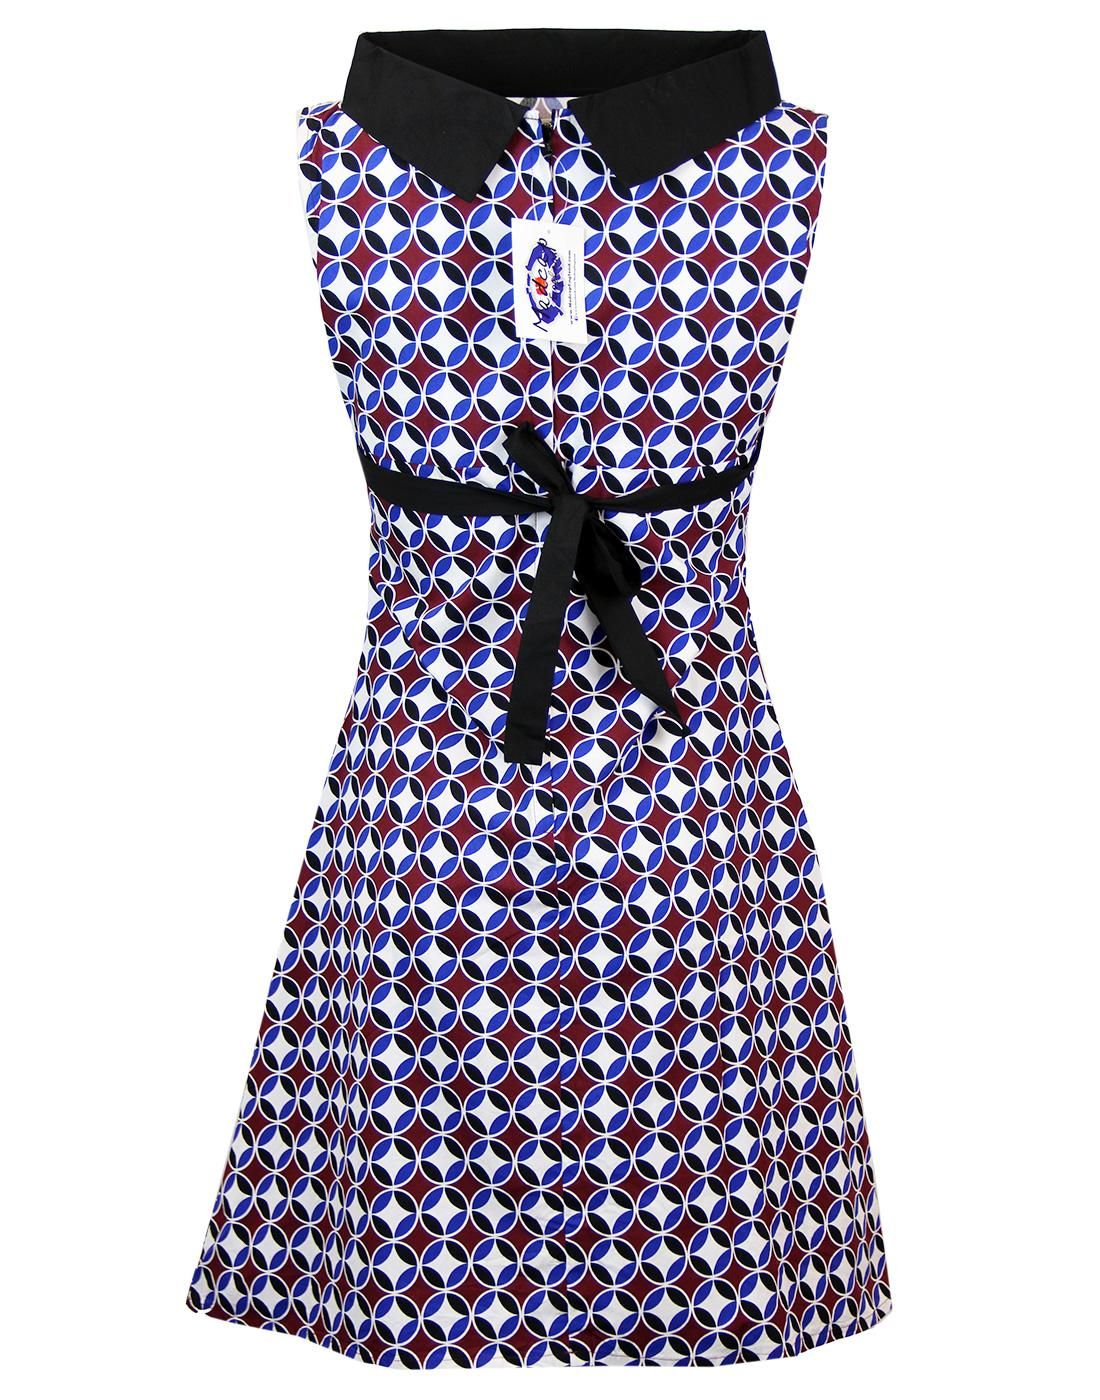 Ace Retro MADCAP ENGLAND 60s Circle Mod Dress (BB) | Dress | Pinterest